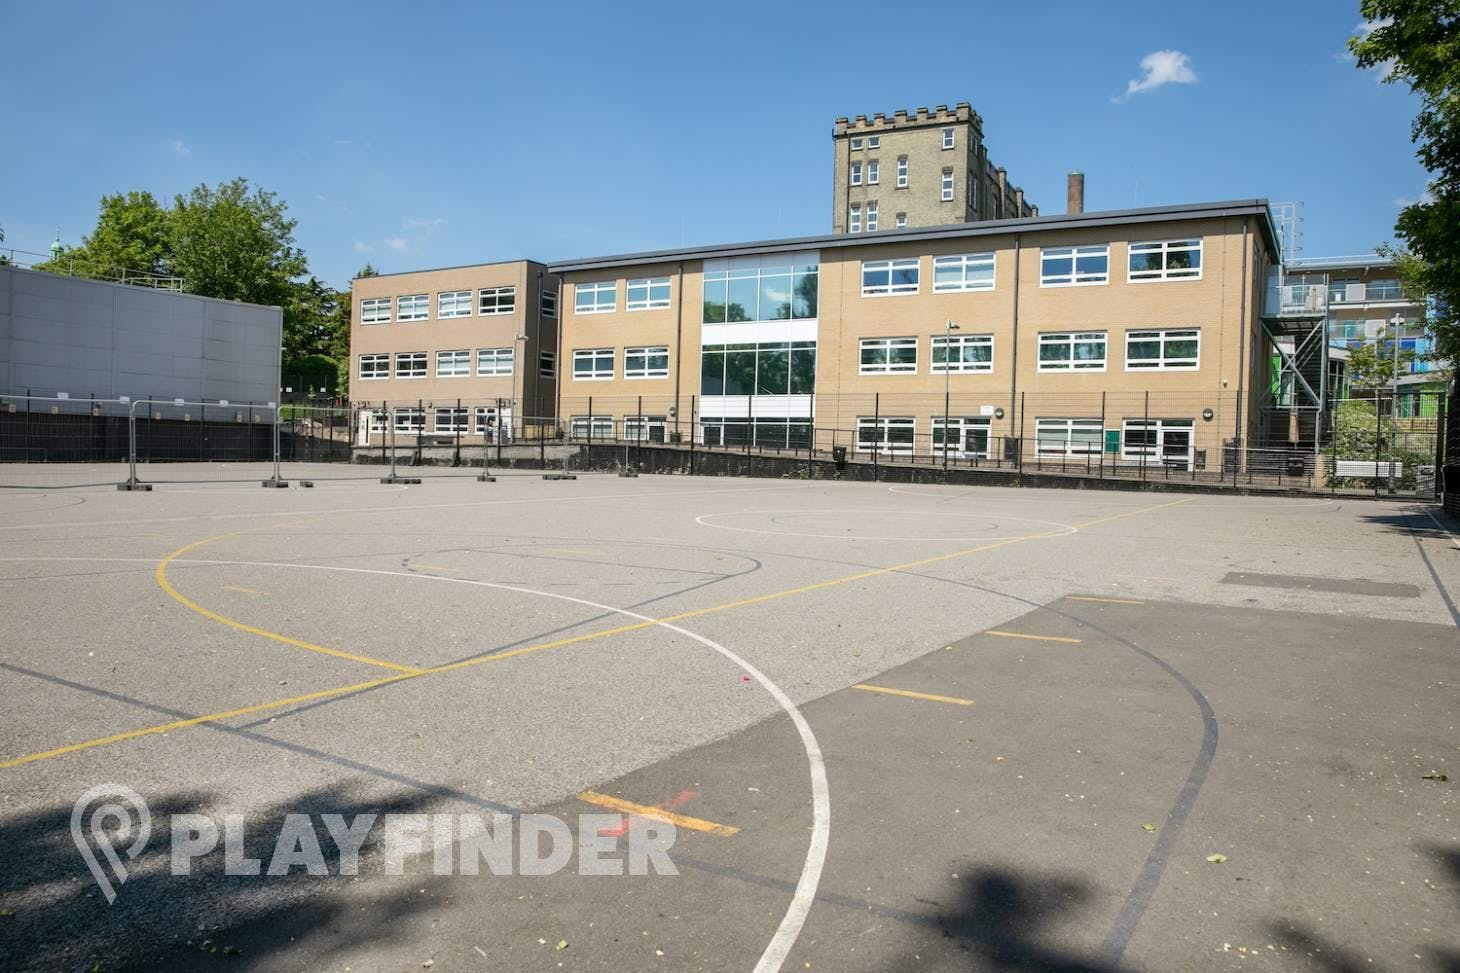 St Aloysius' College 5 a side | Hard (macadam) football pitch